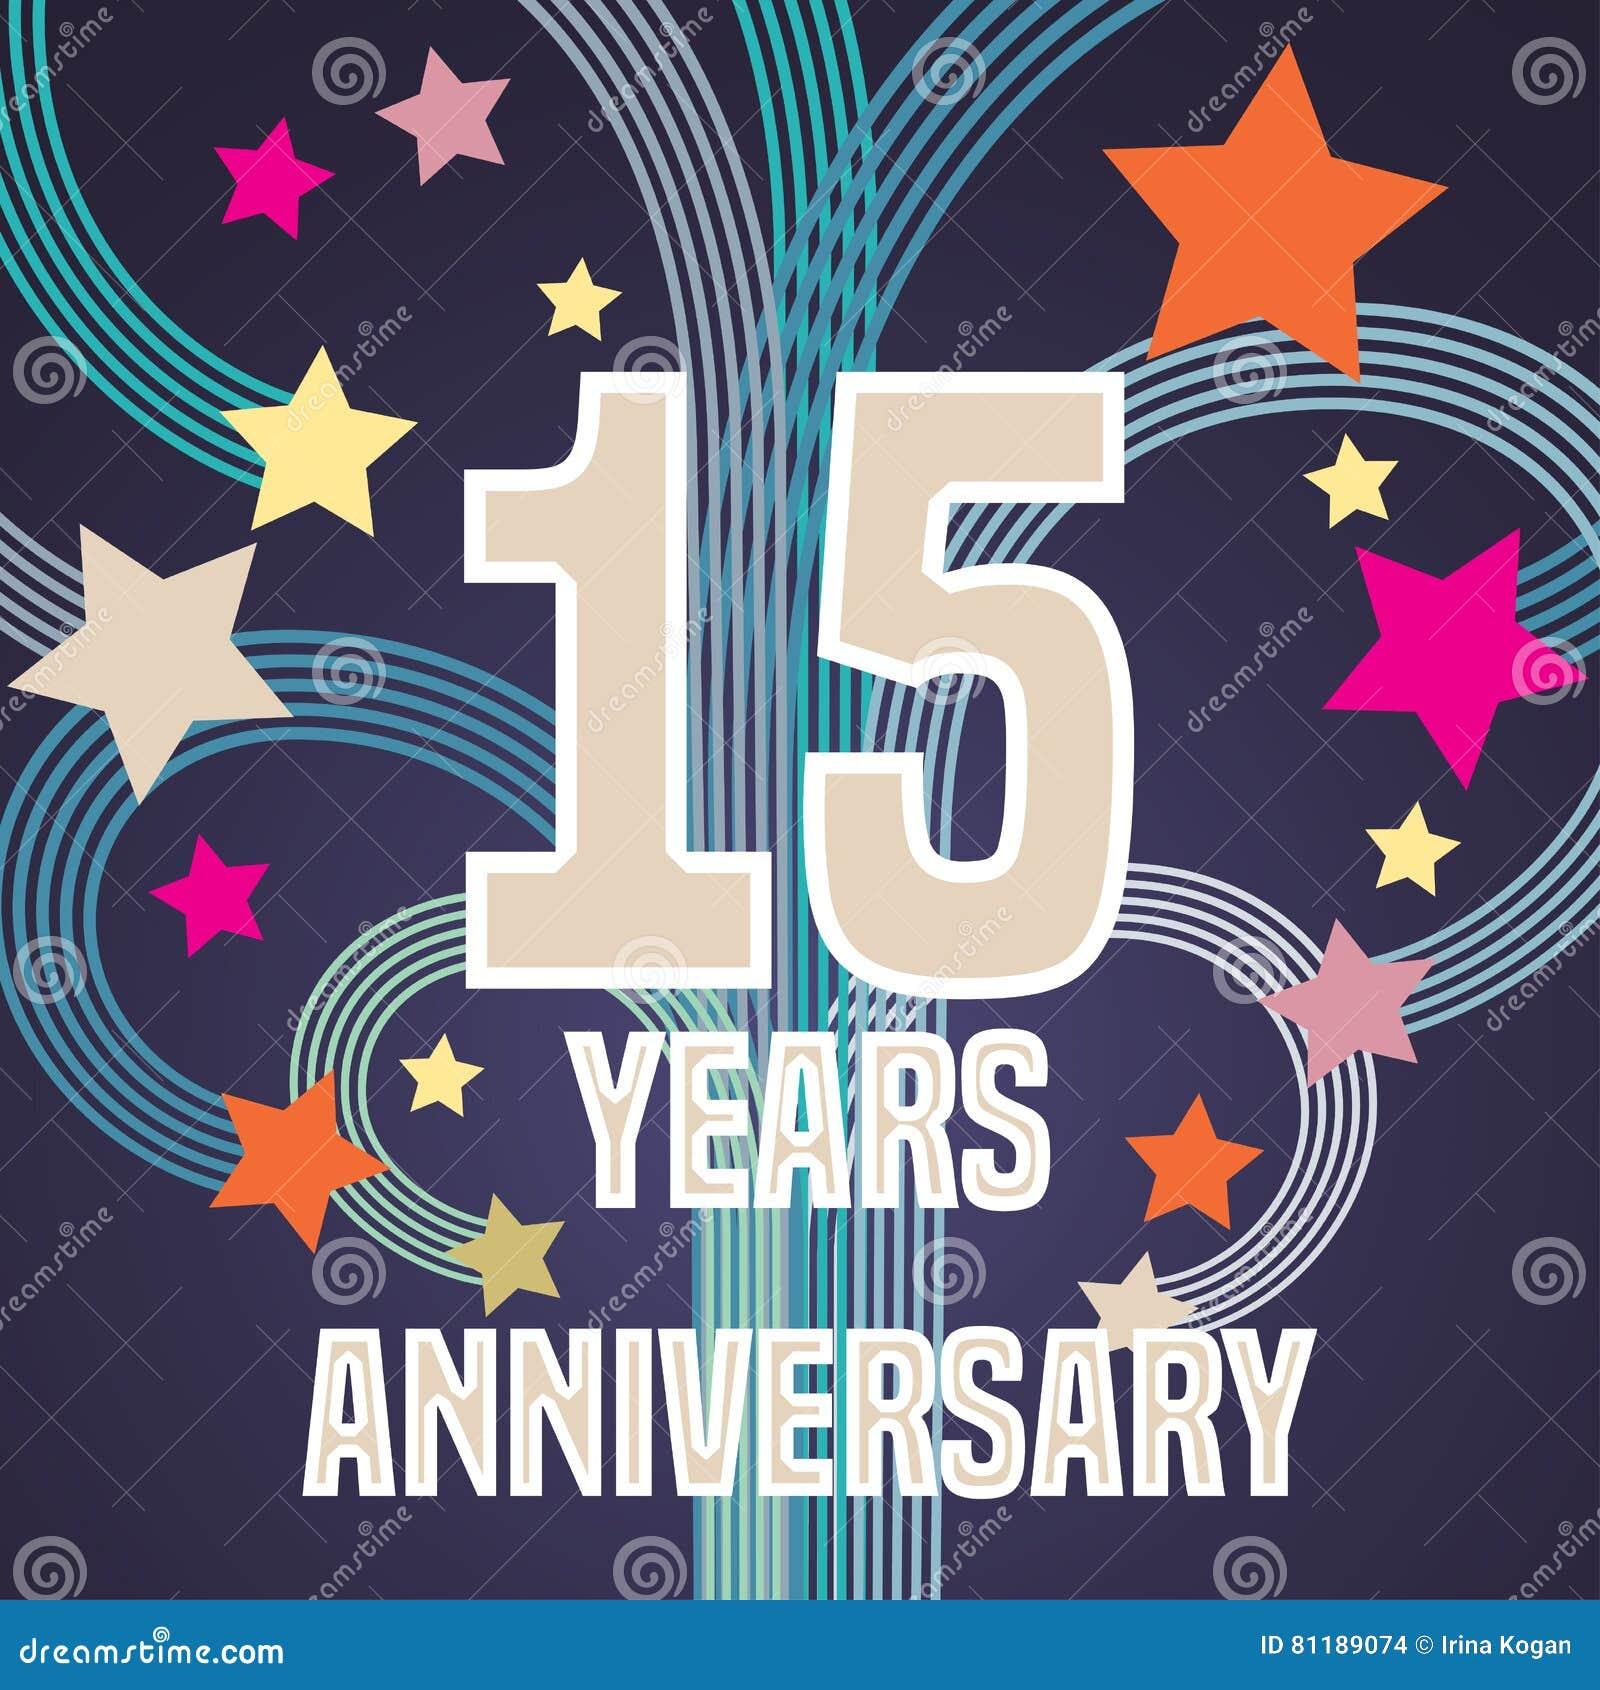 15 Years Anniversary Vector Illustration Banner Flyer Icon